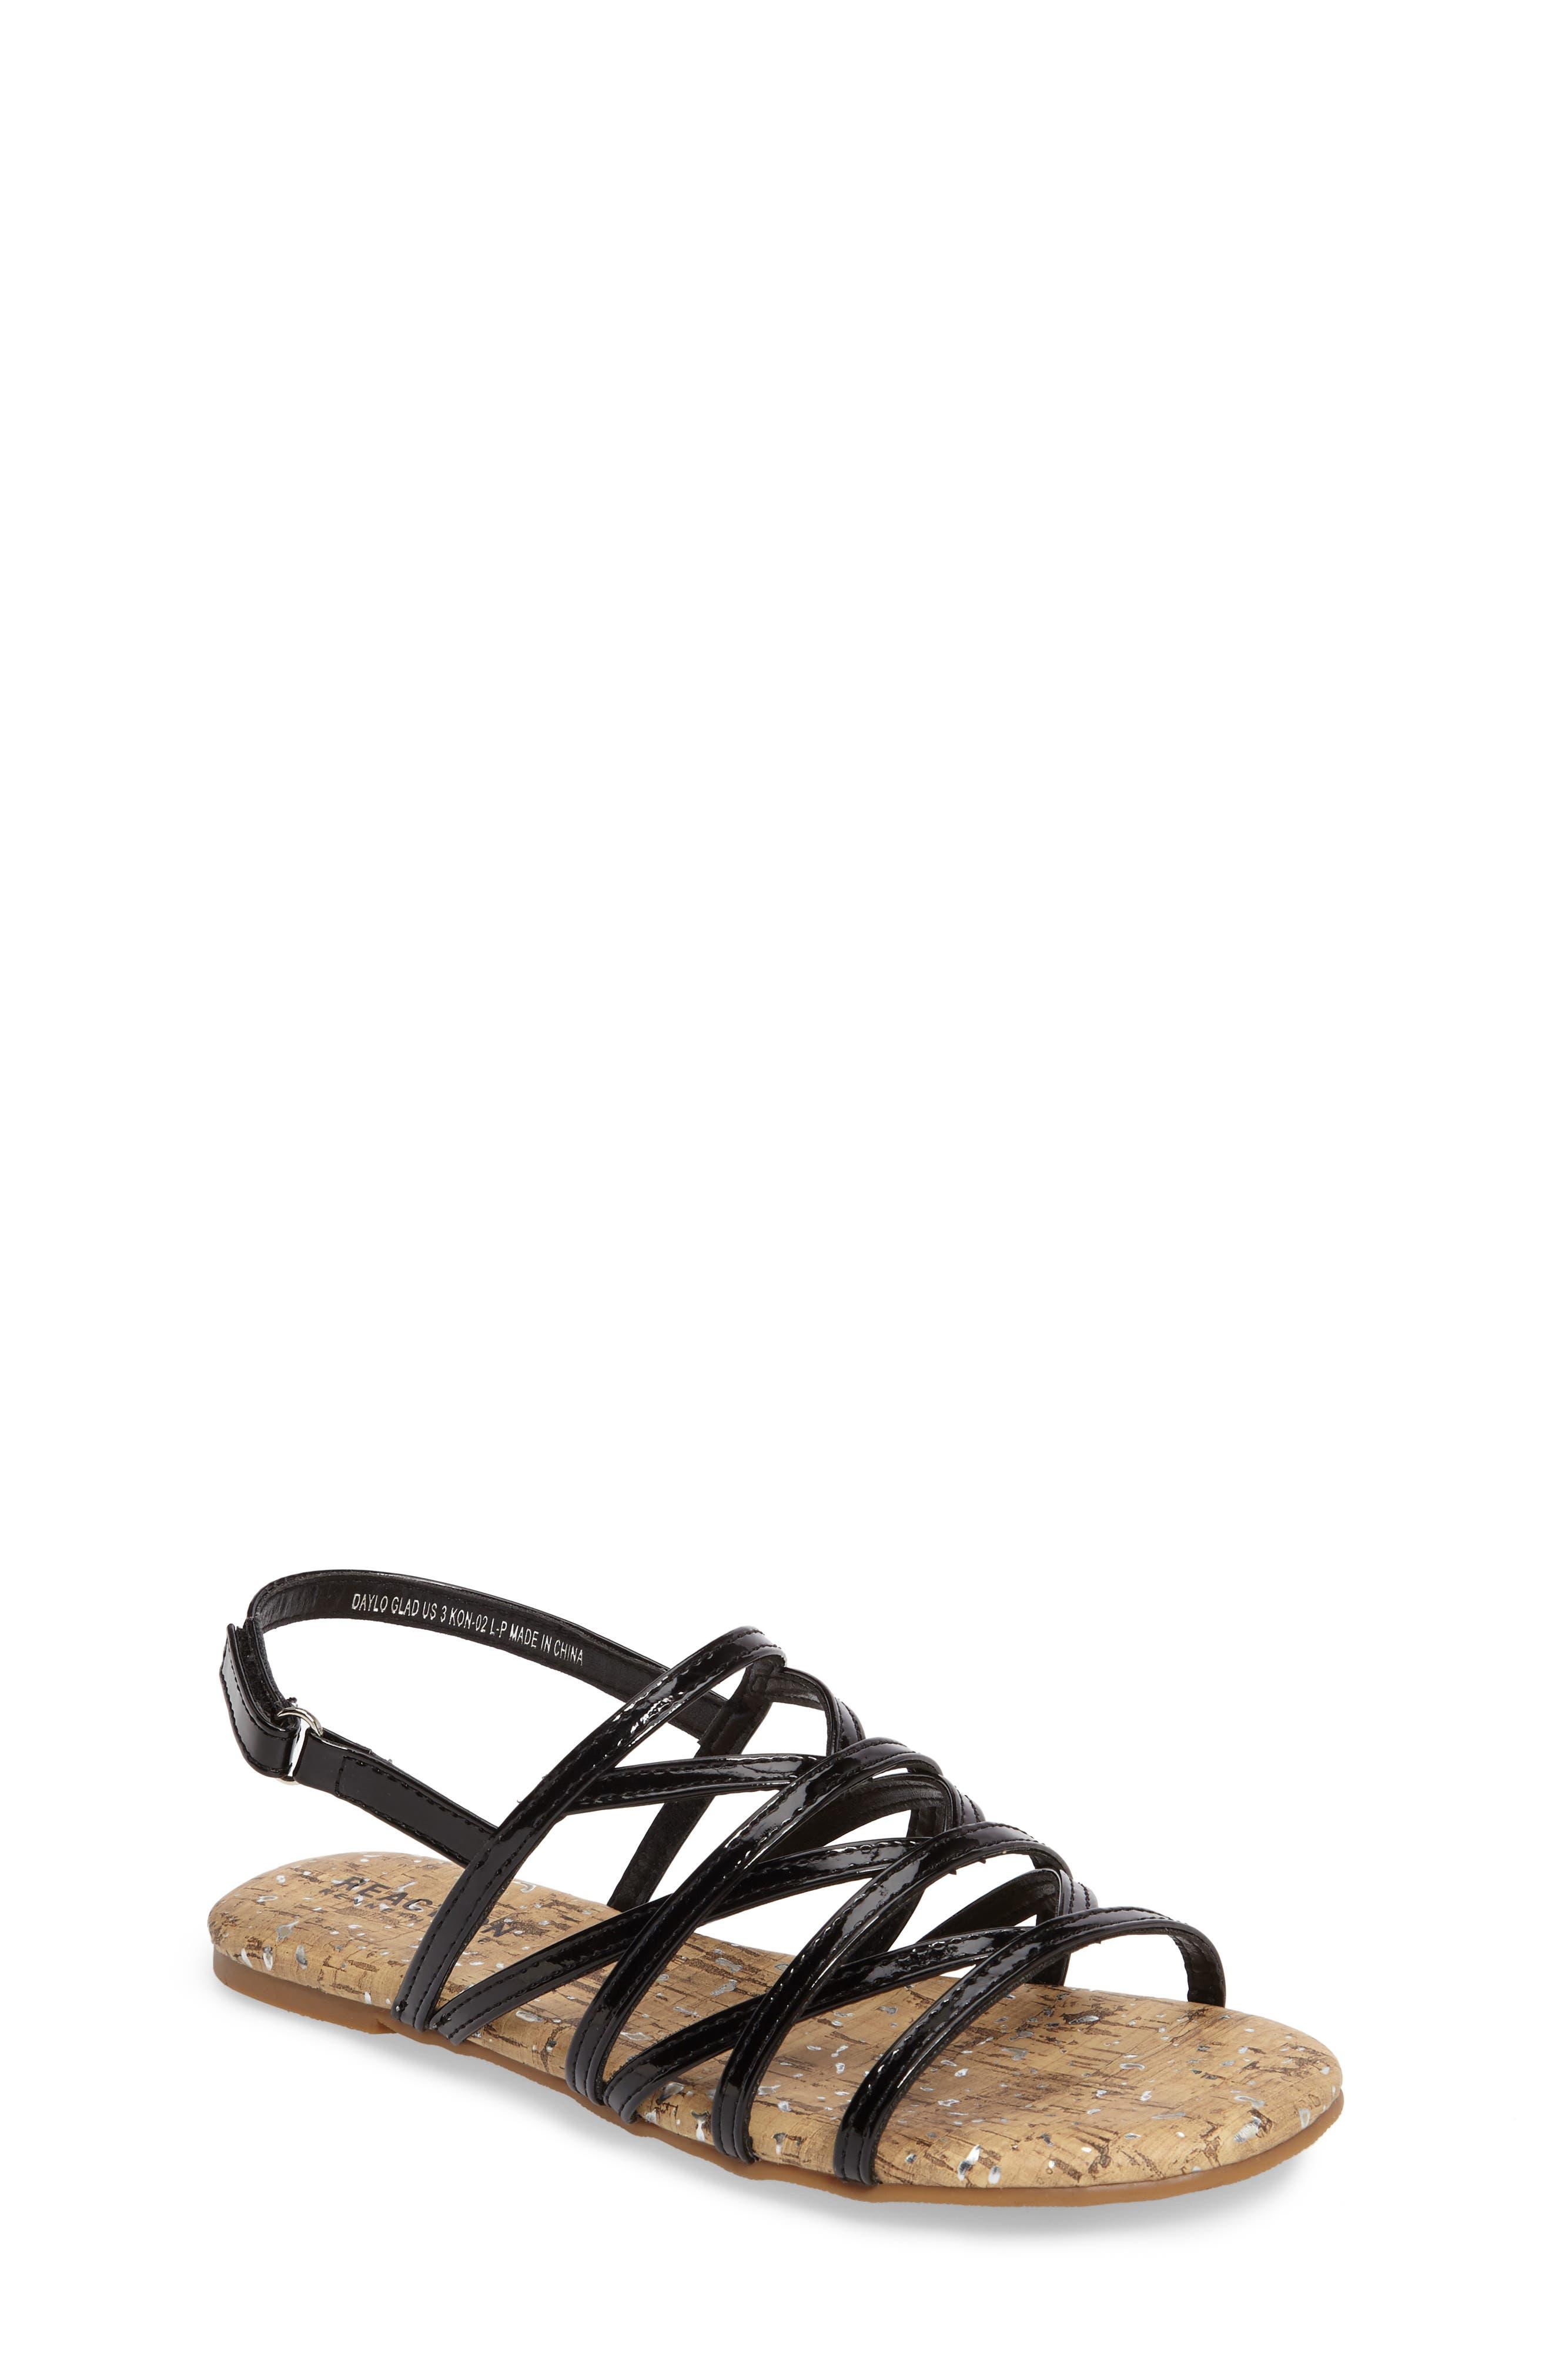 KENNETH COLE NEW YORK Daylo Glad Strappy Sandal